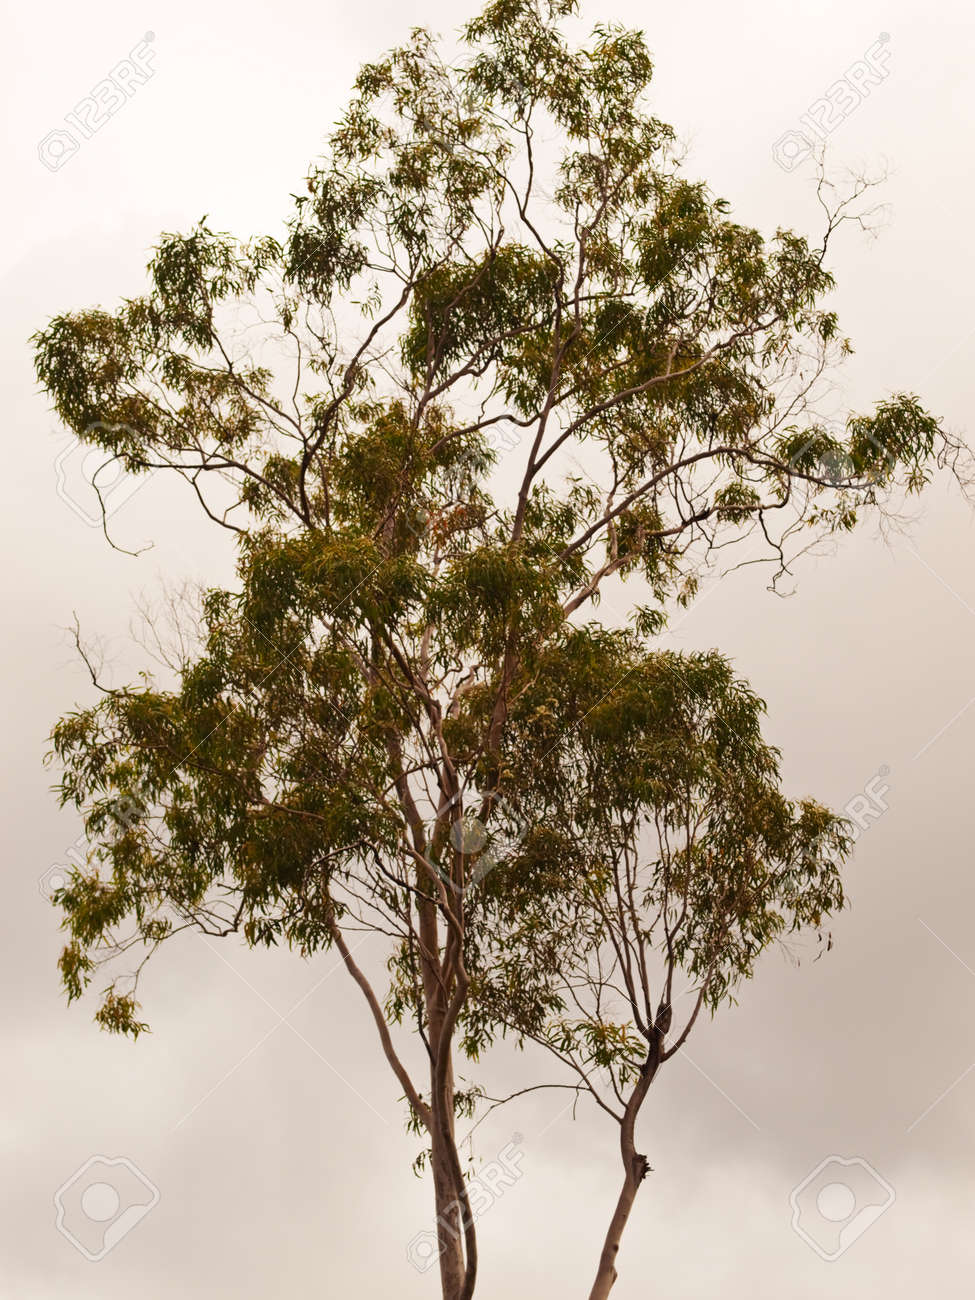 Australian Gum Tree Backdrop for background - 19714331